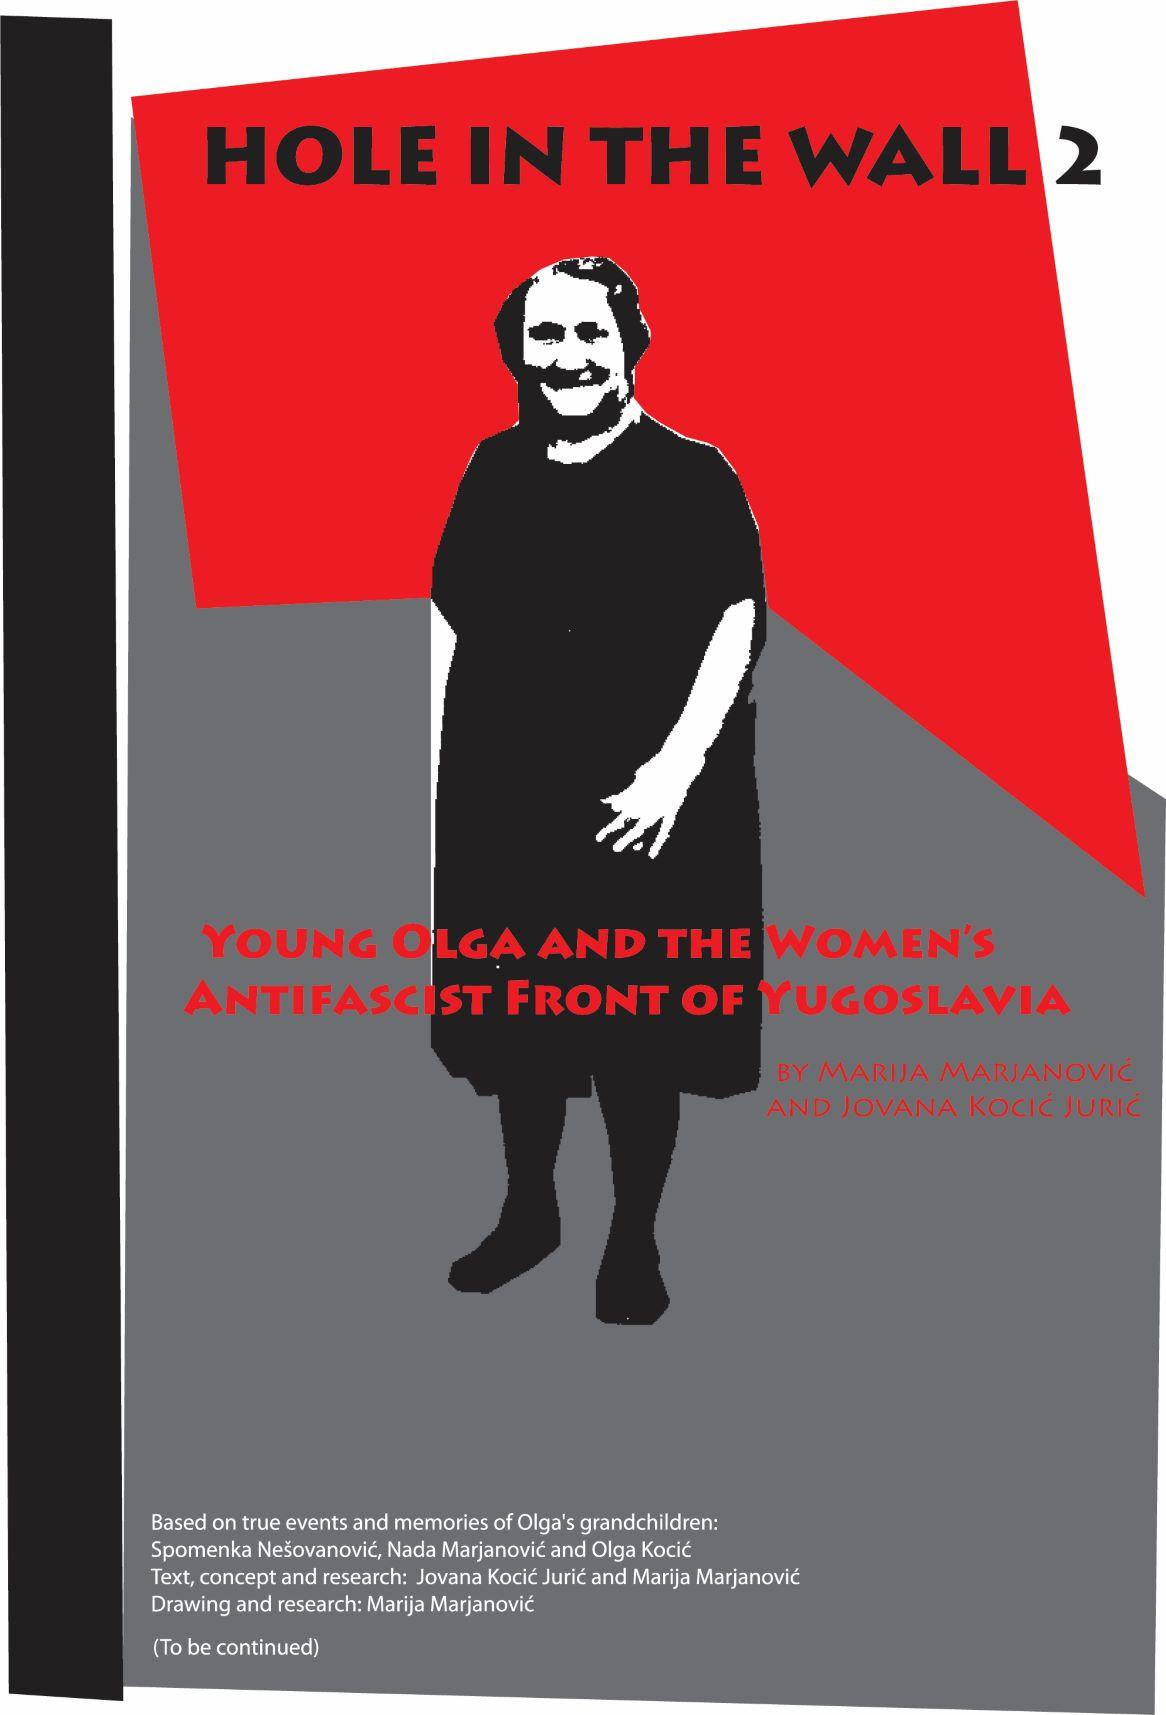 Marija Marjanović & Jovana Kocić Jurić: HOLE IN THE WALL; Young Olga and the Women's Antifascist Front of Yugoslavia